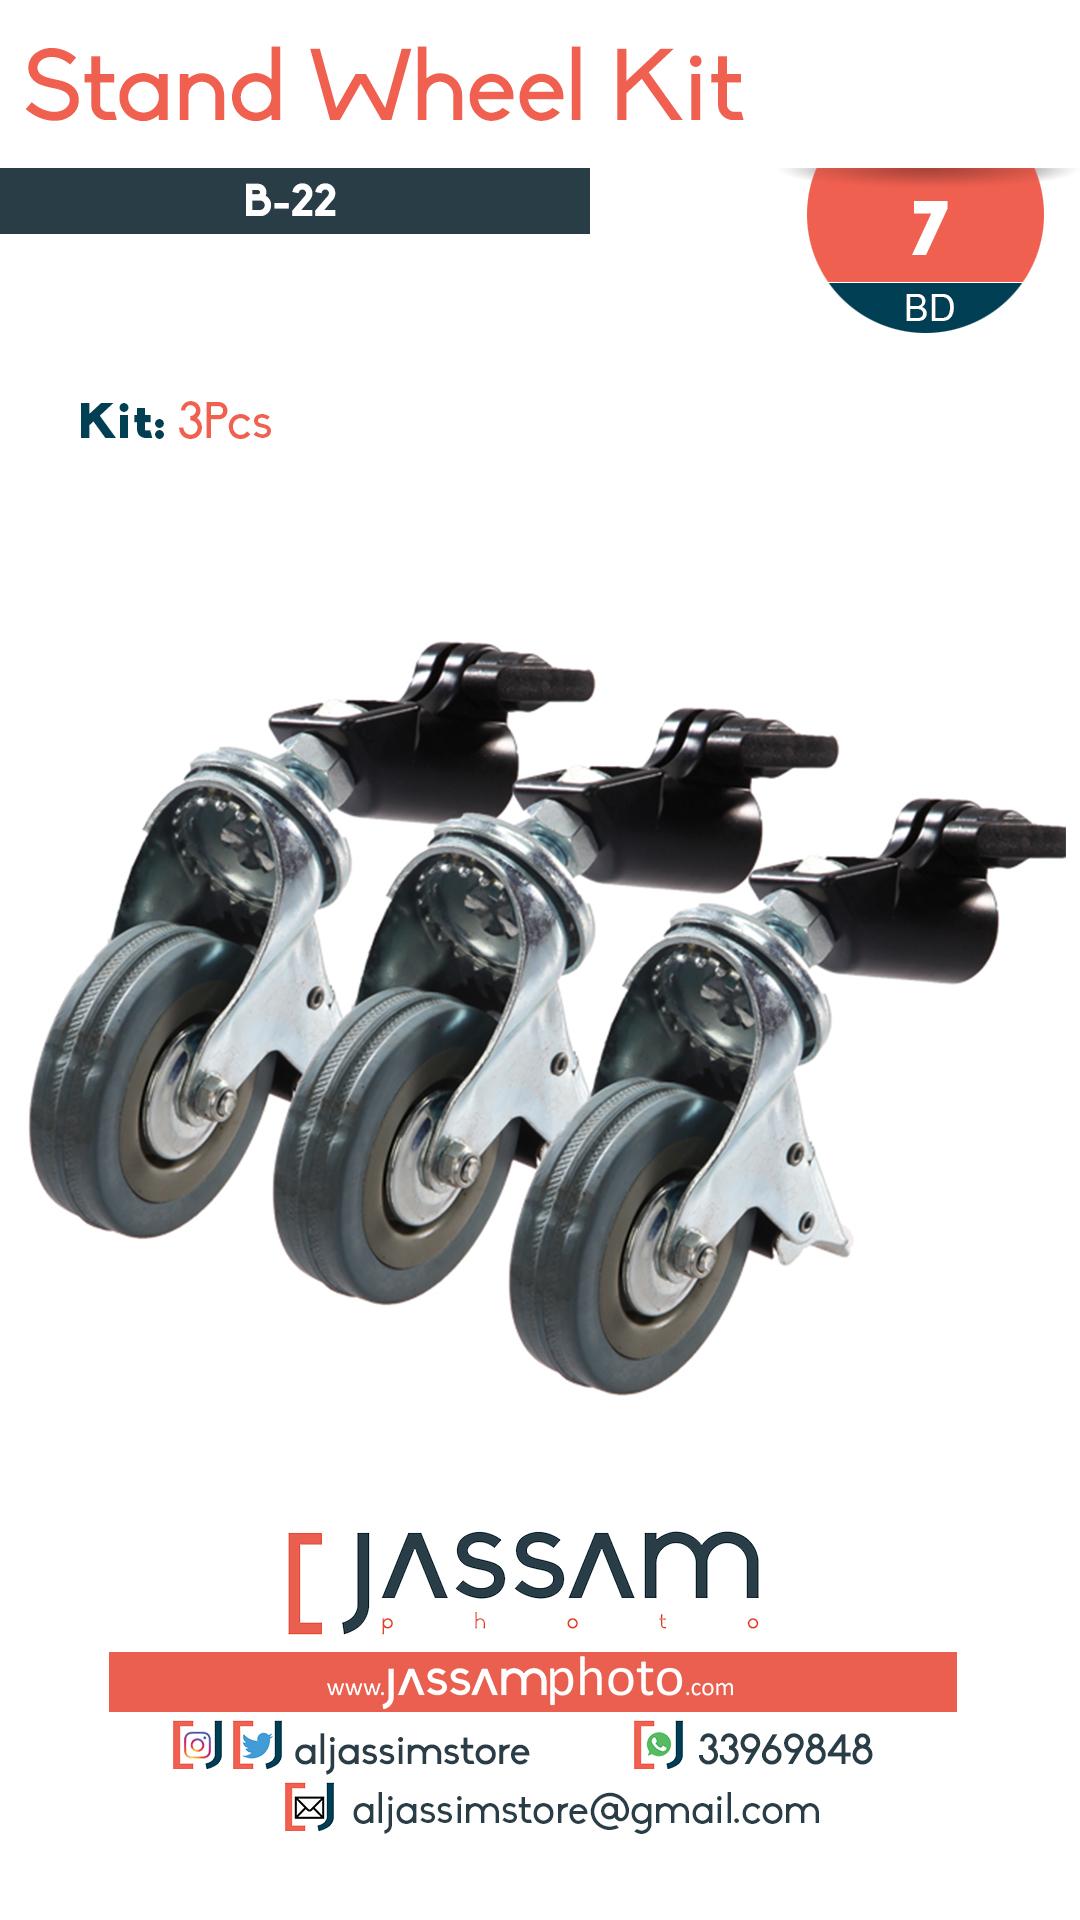 Stand Wheel Kit B-22